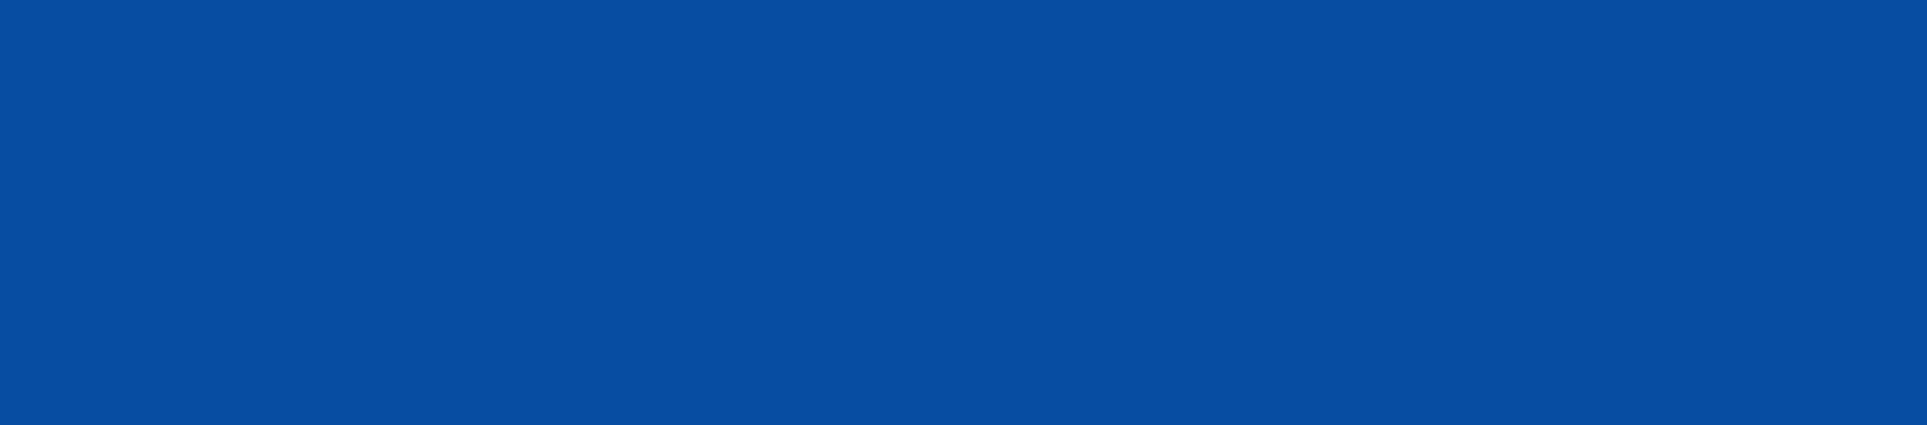 JOSERA Logo for the Erbacher Foundation